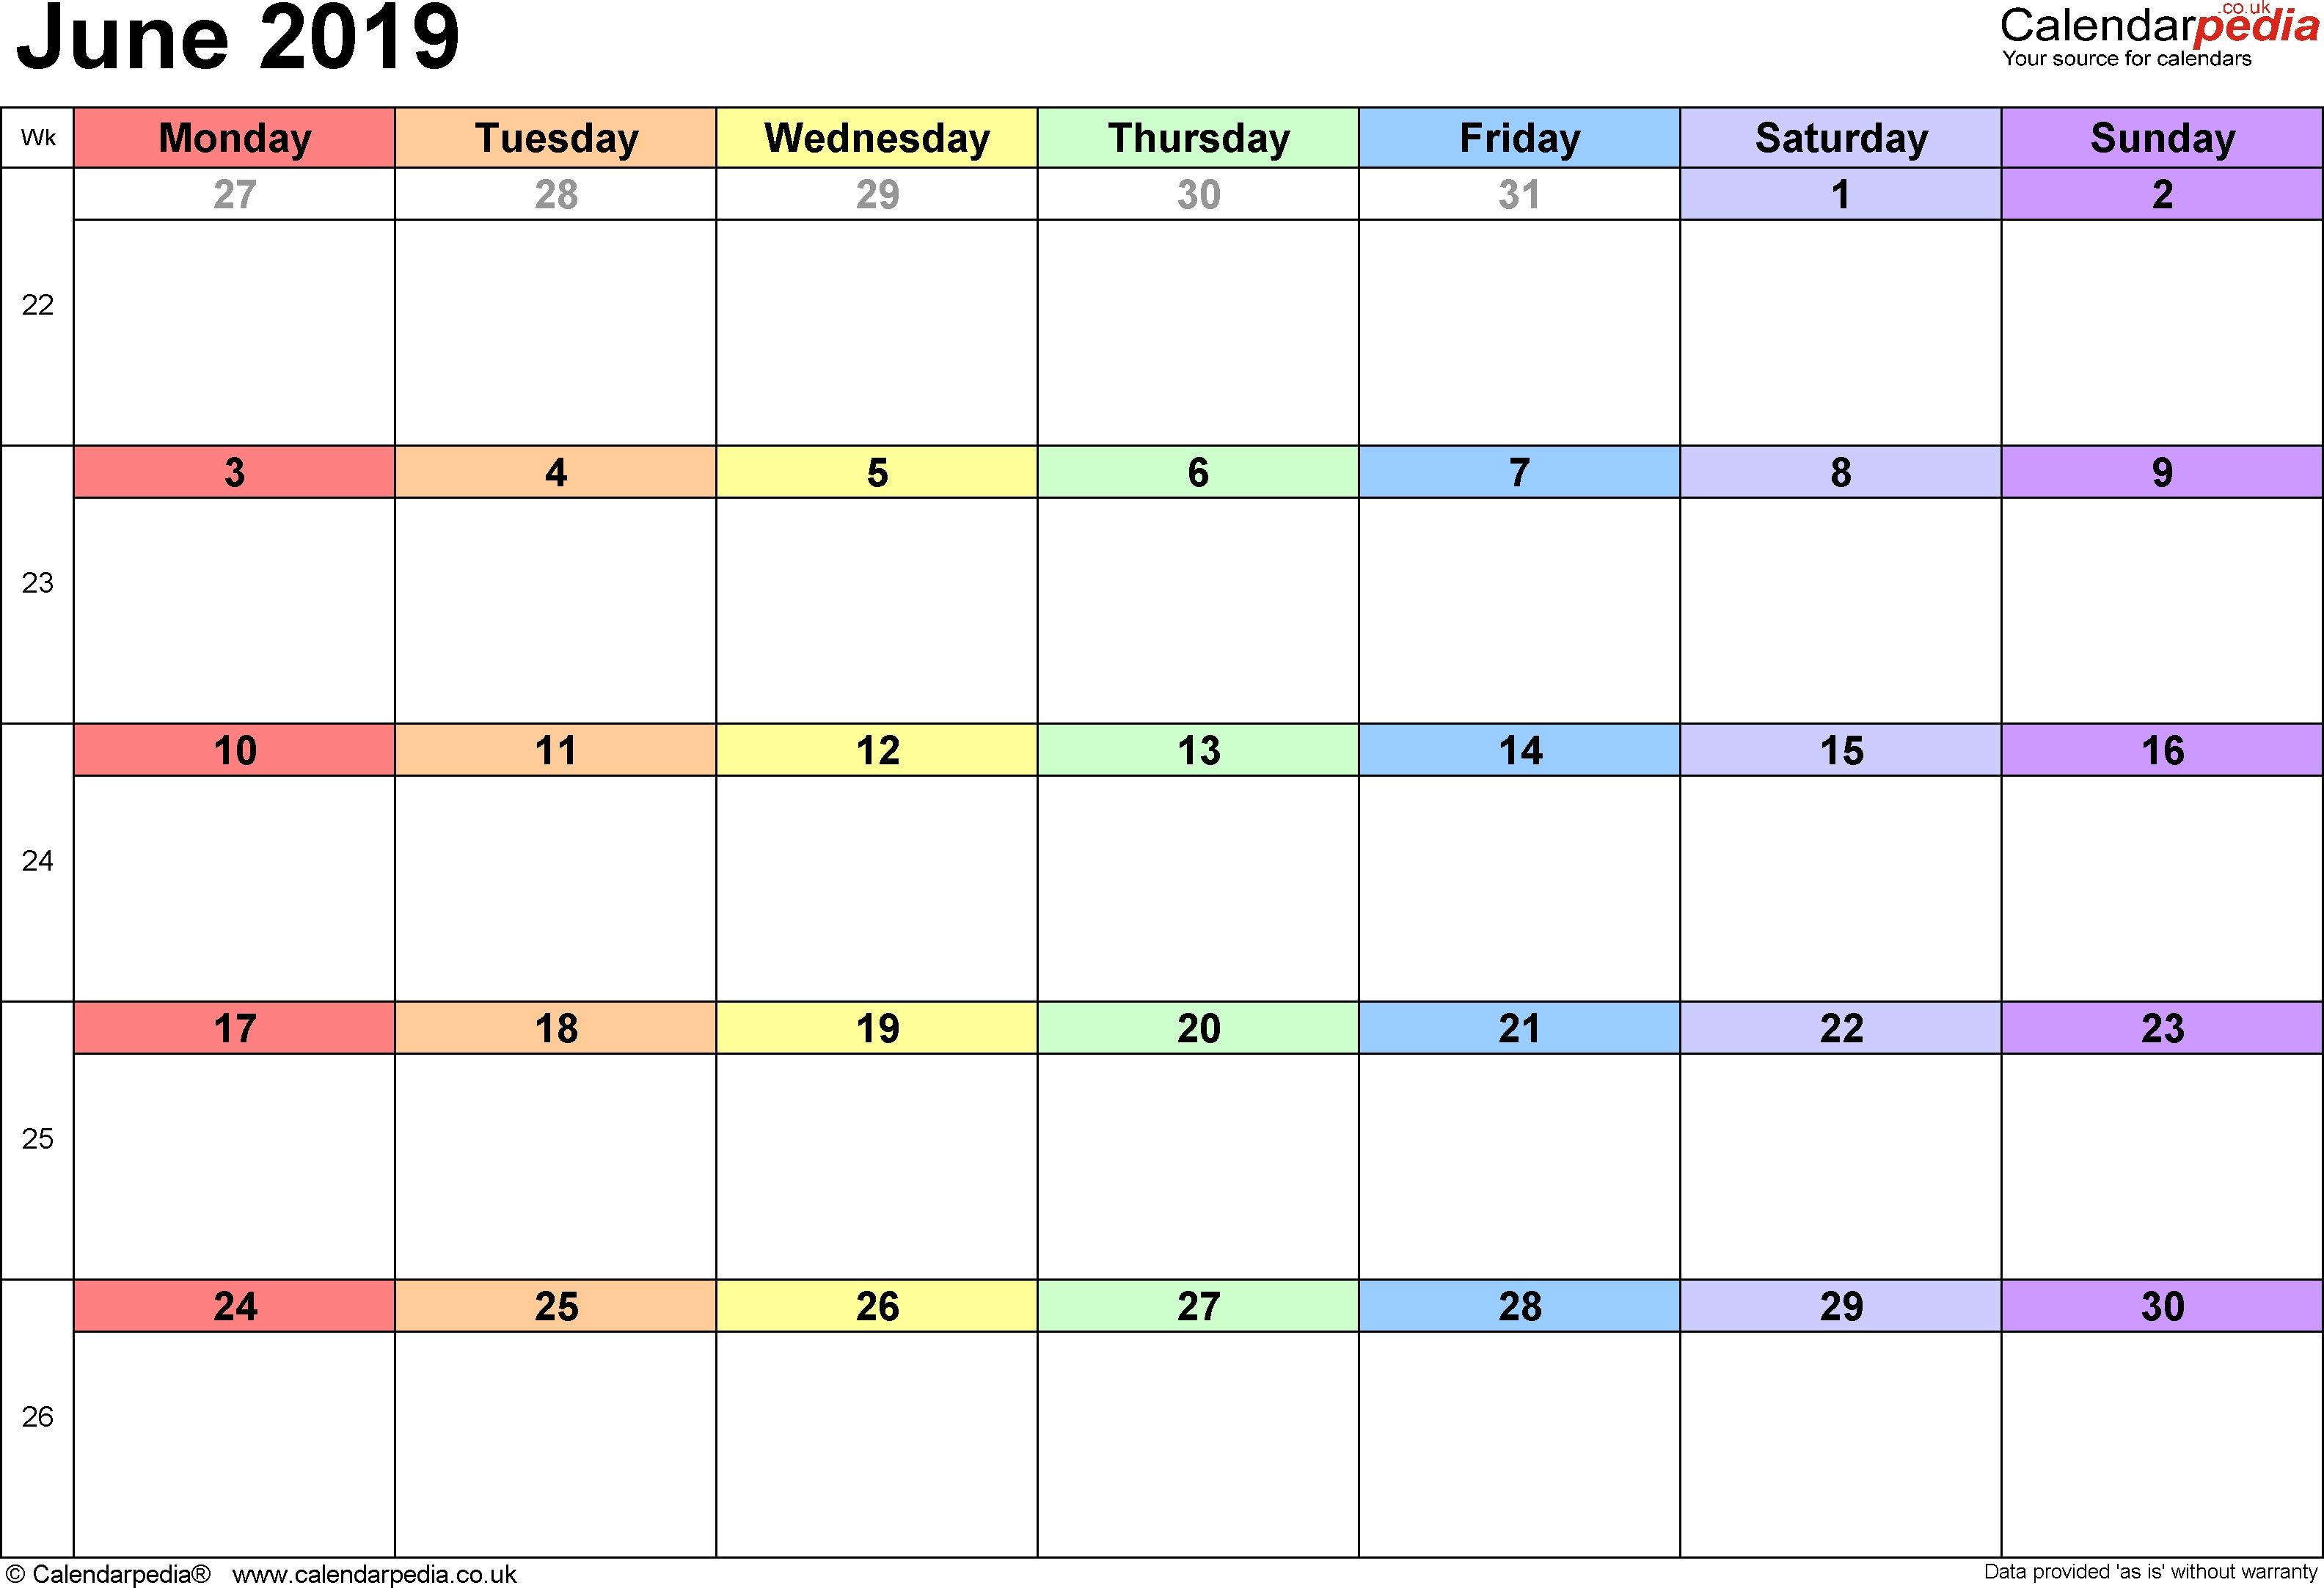 Google Docs Calendar June Template 2019 | Google Docs : A Good Fit Calendar 2019 Google